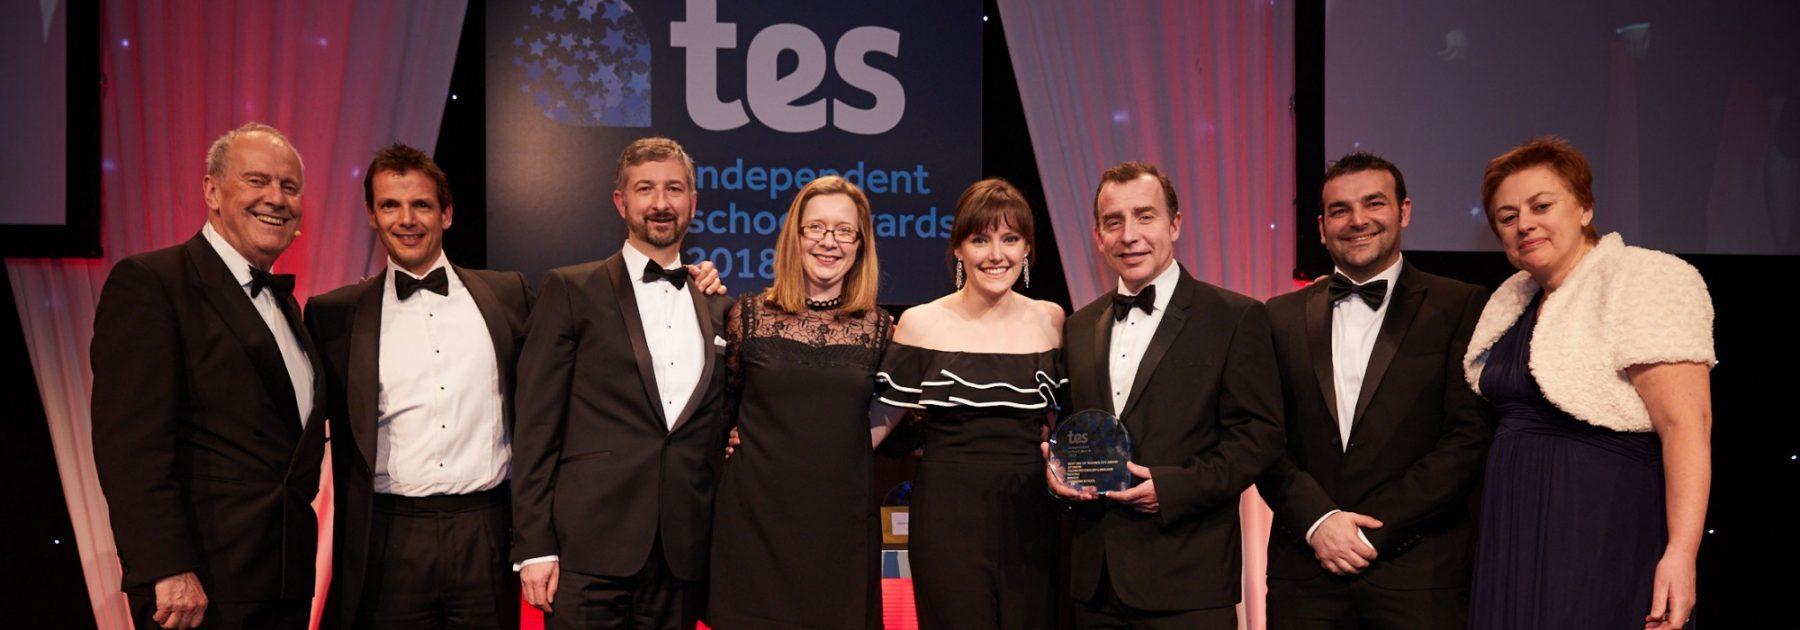 TES Award Winner!